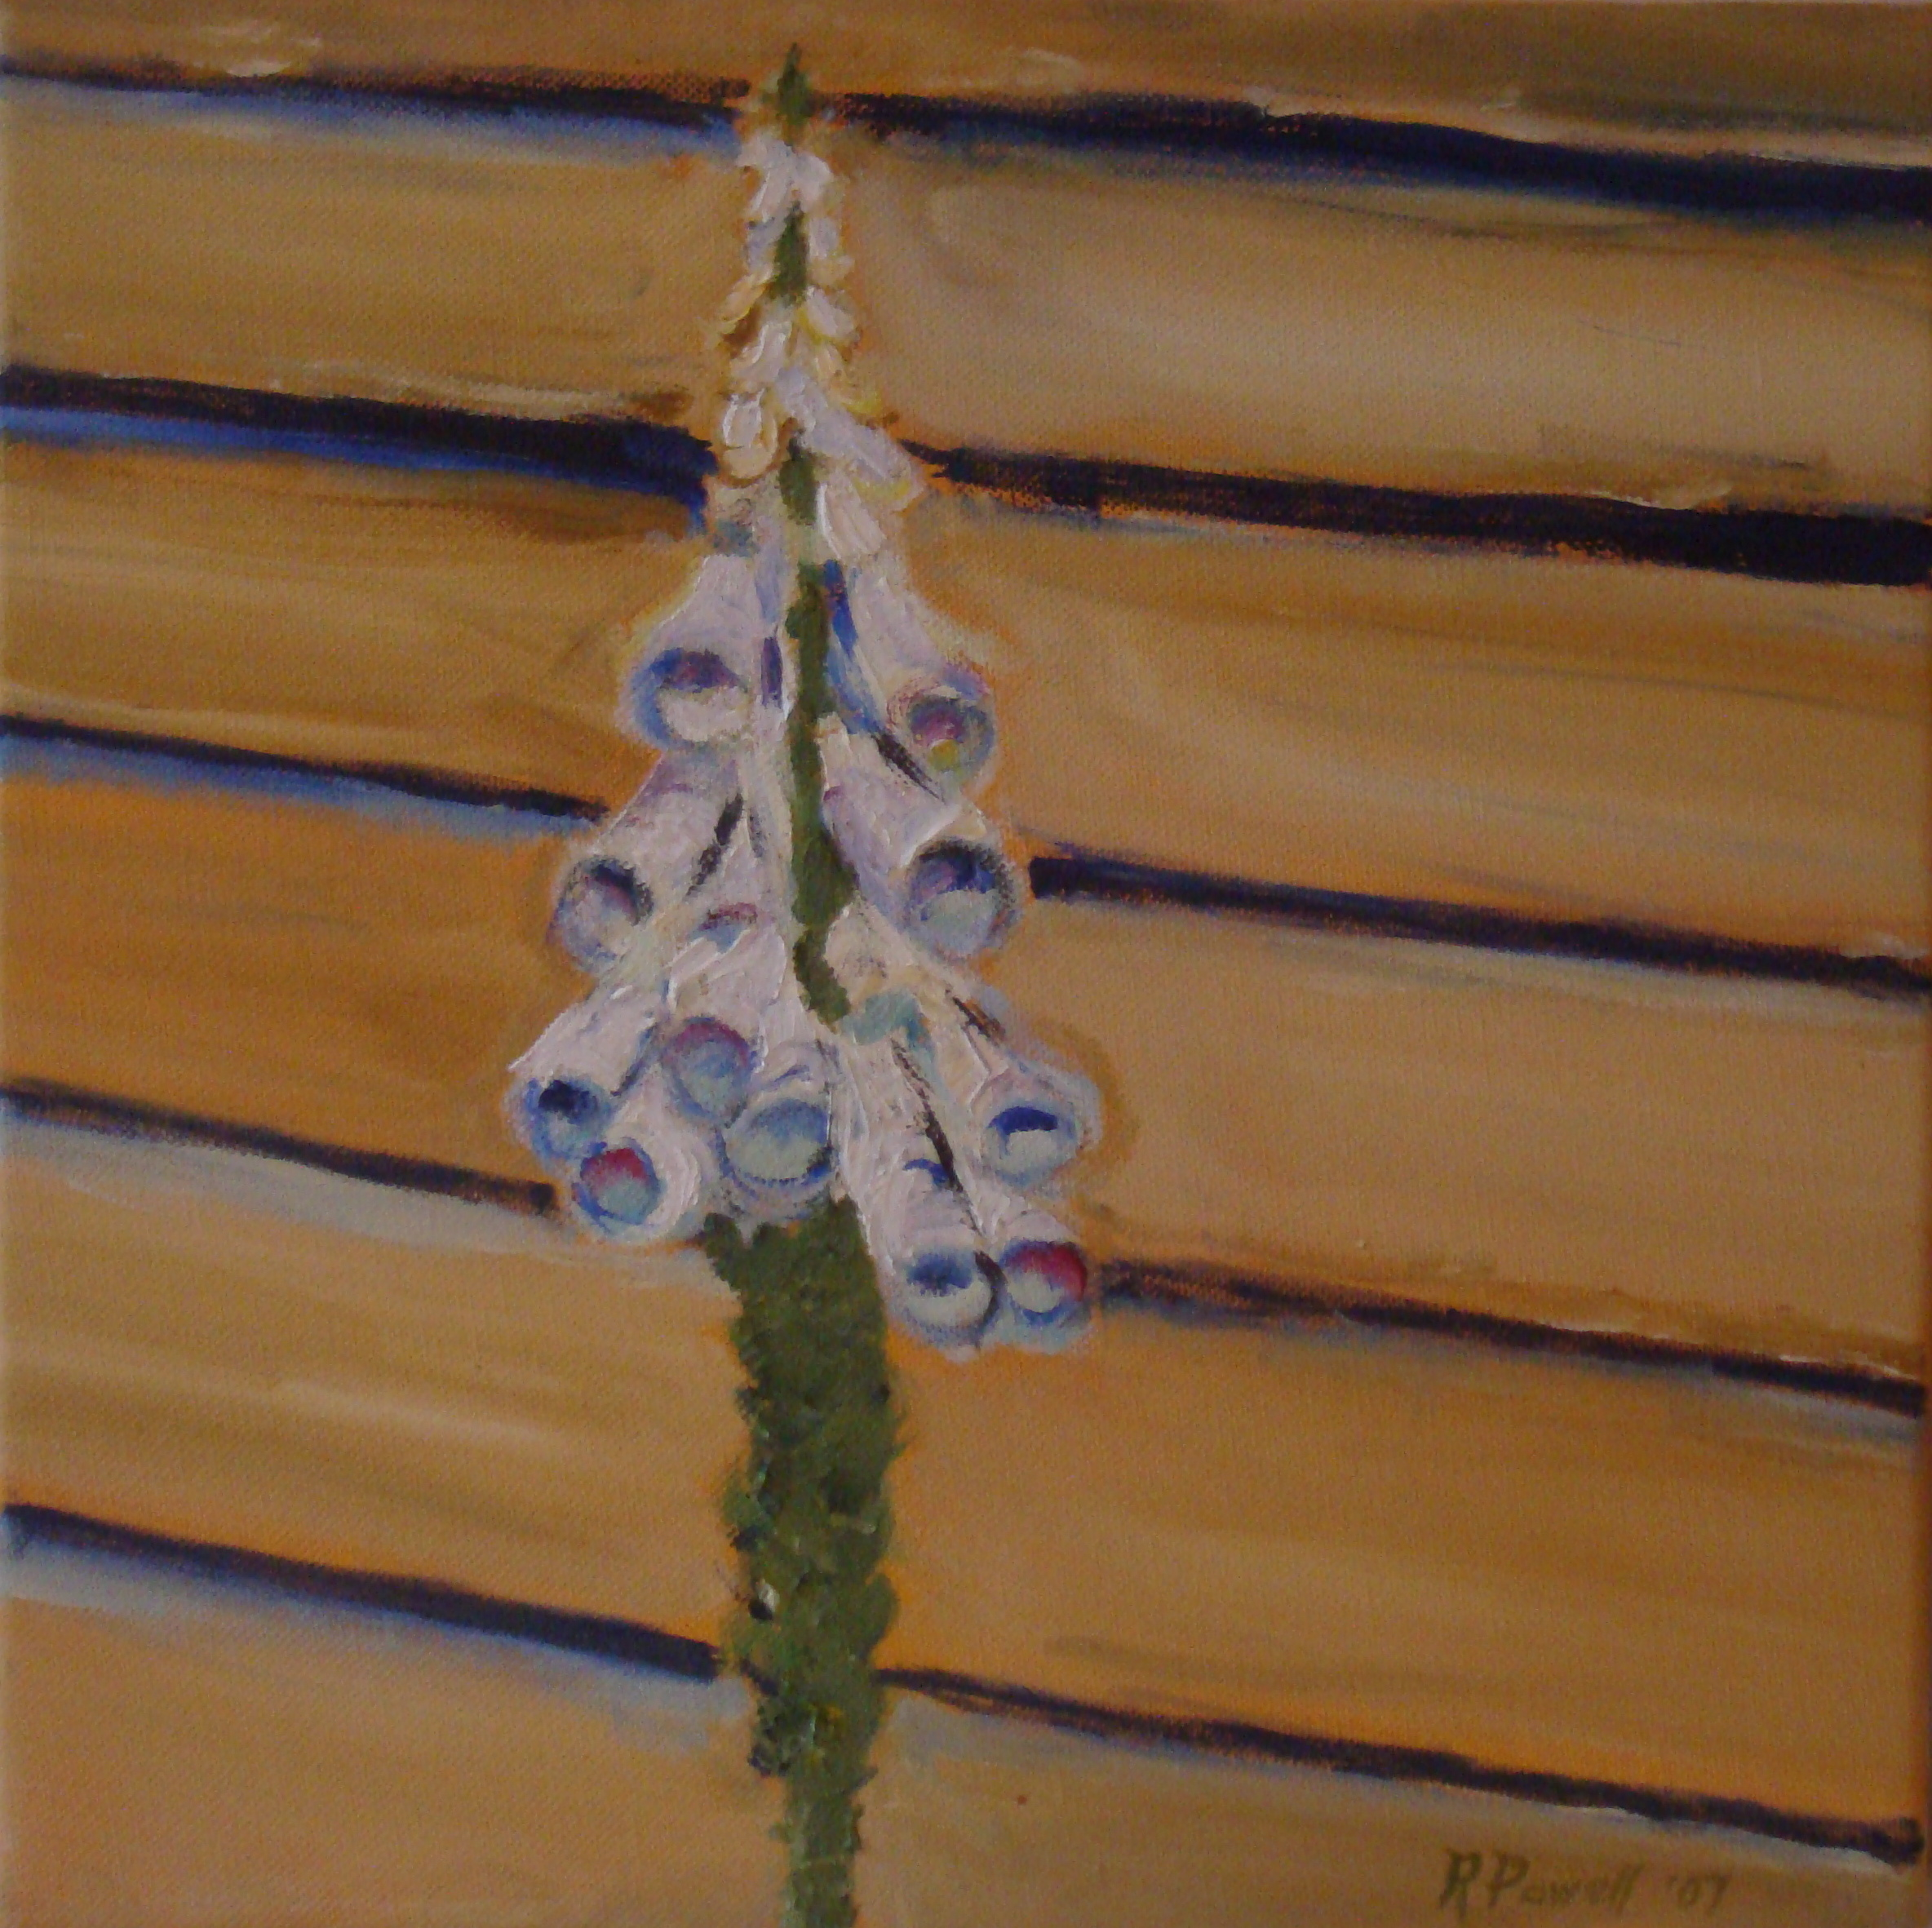 Foxglove (Digitalis), Russell Steven Powell oil on canvas, 12x12